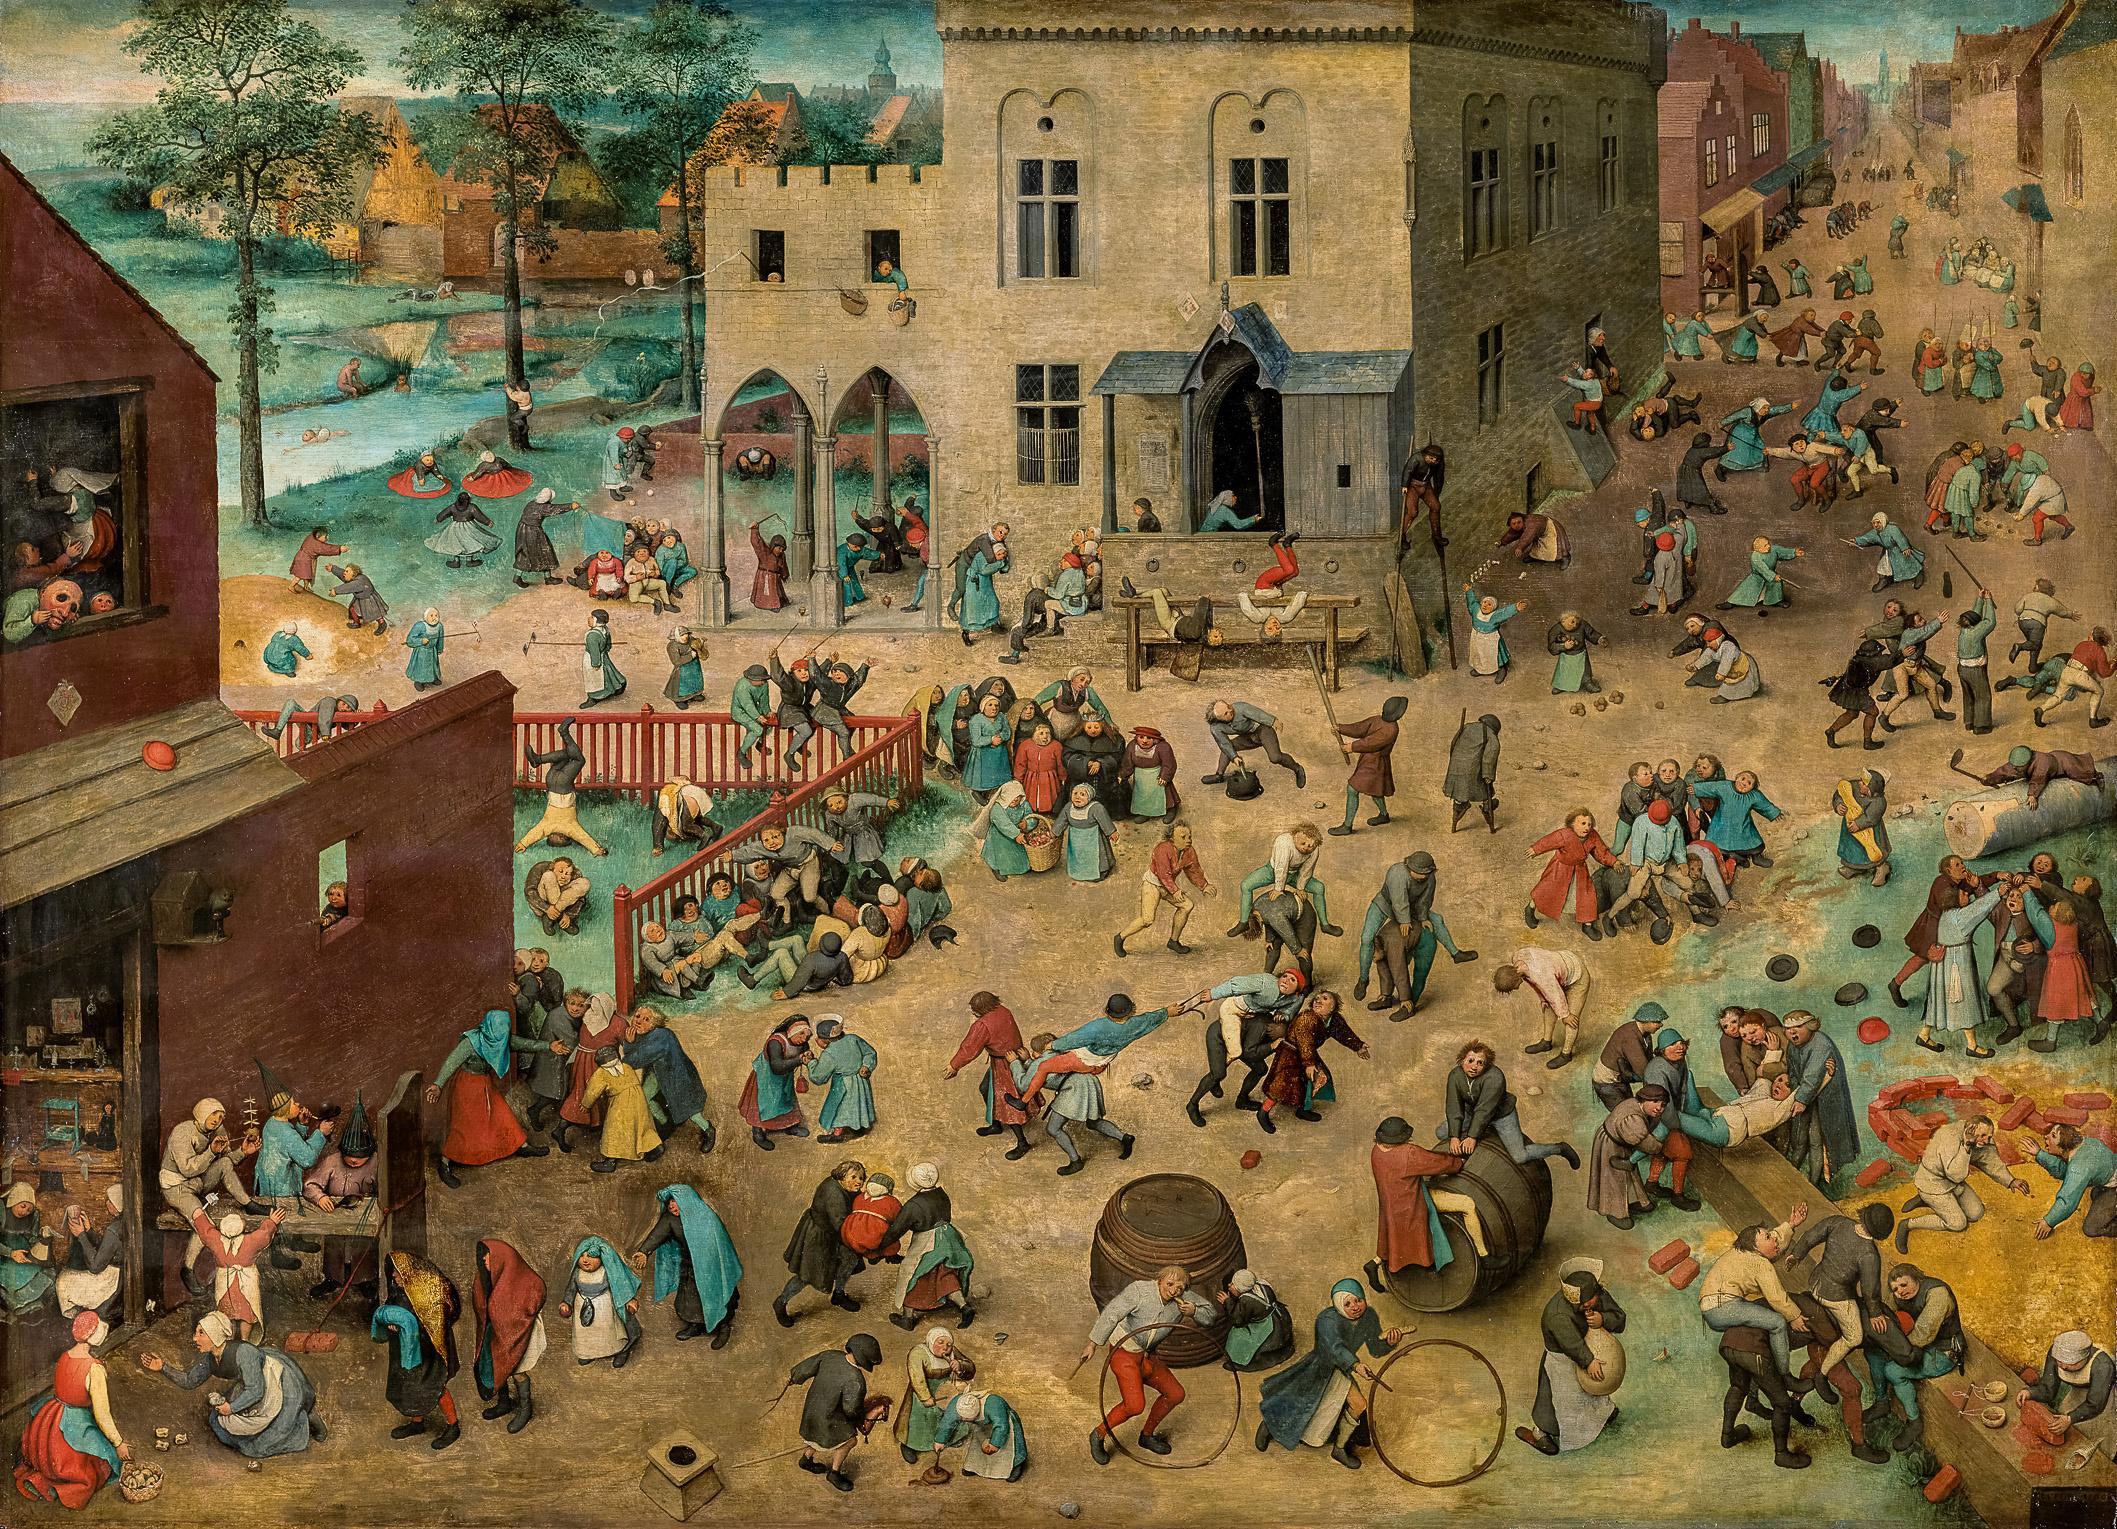 Bruegel review – beer, pancakes, and the limitless genius of Bruegel